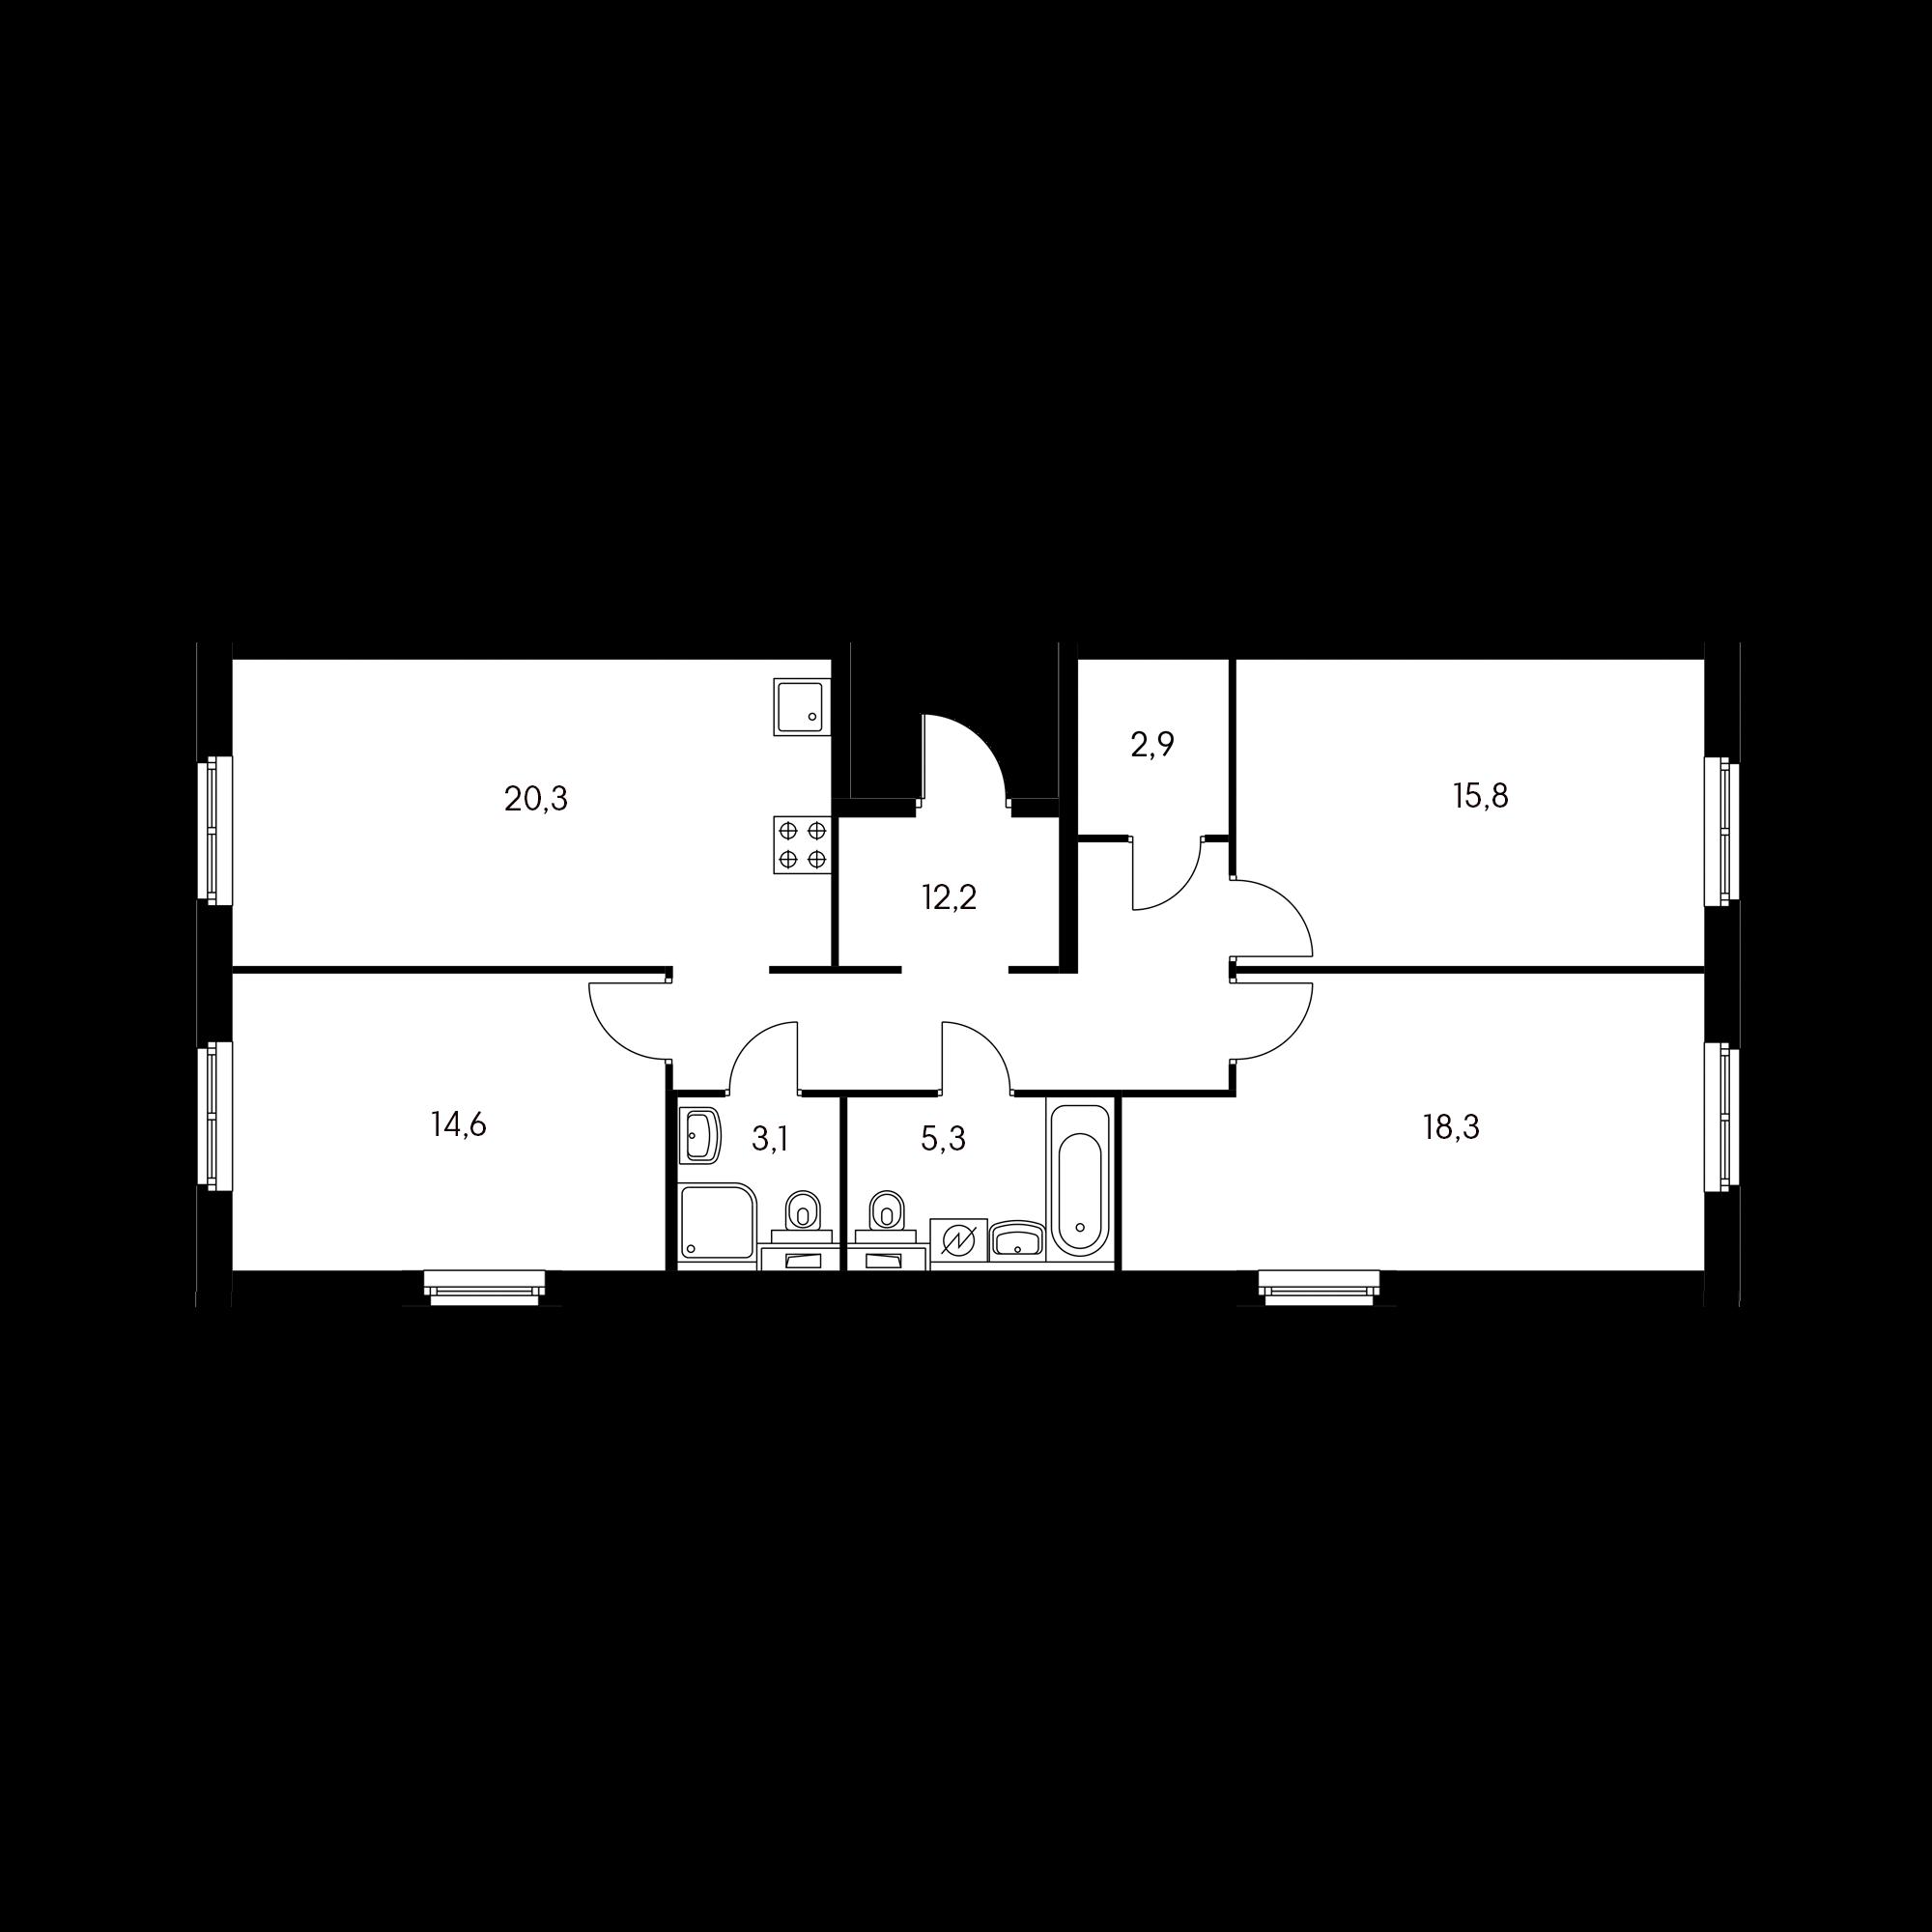 3EL5_28